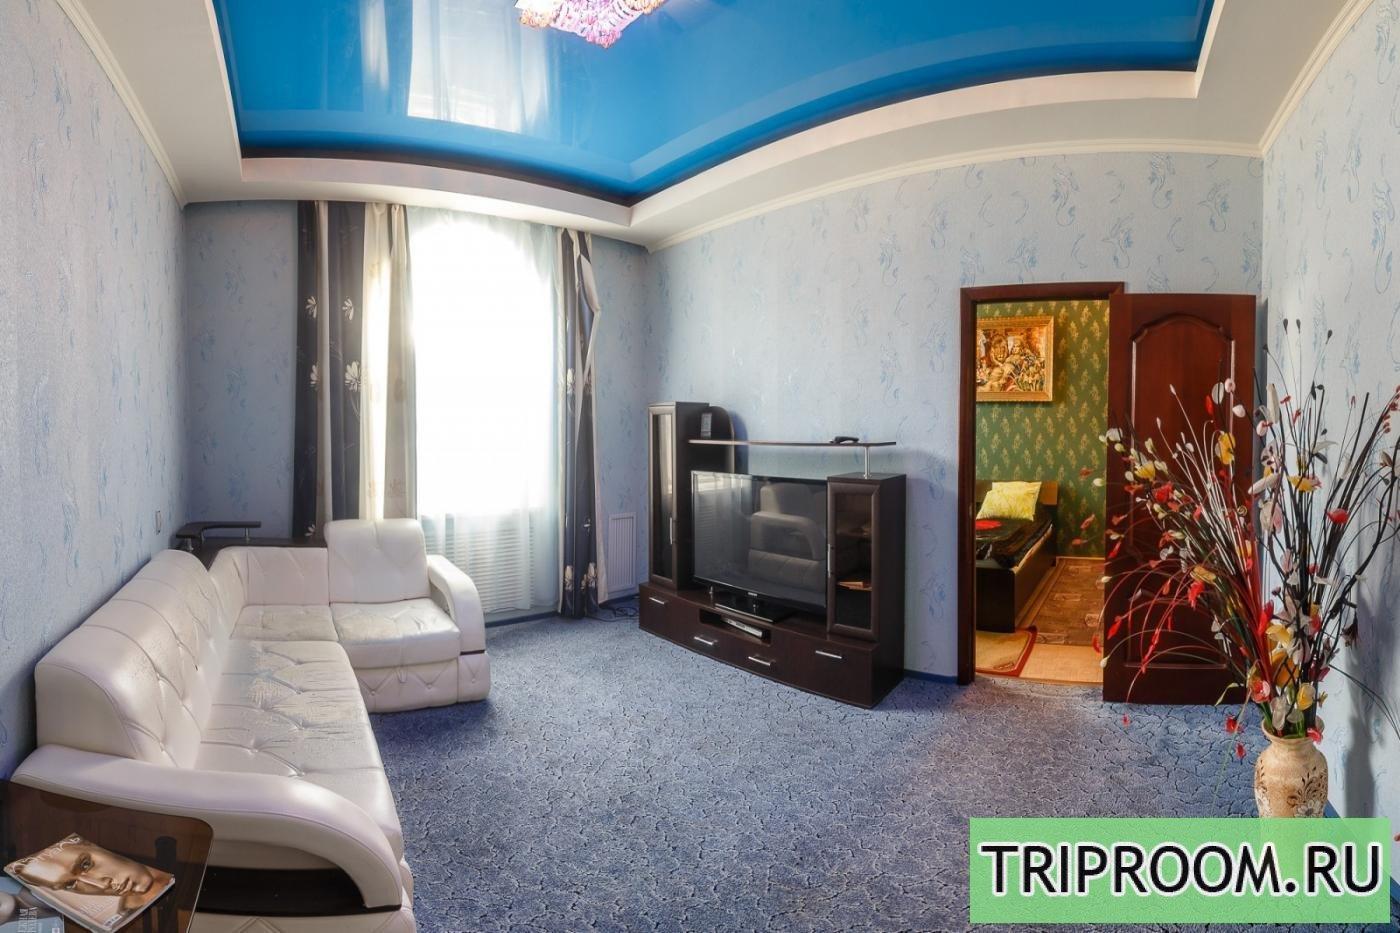 3-комнатная квартира посуточно (вариант № 15948), ул. Назарбаева улица, фото № 1